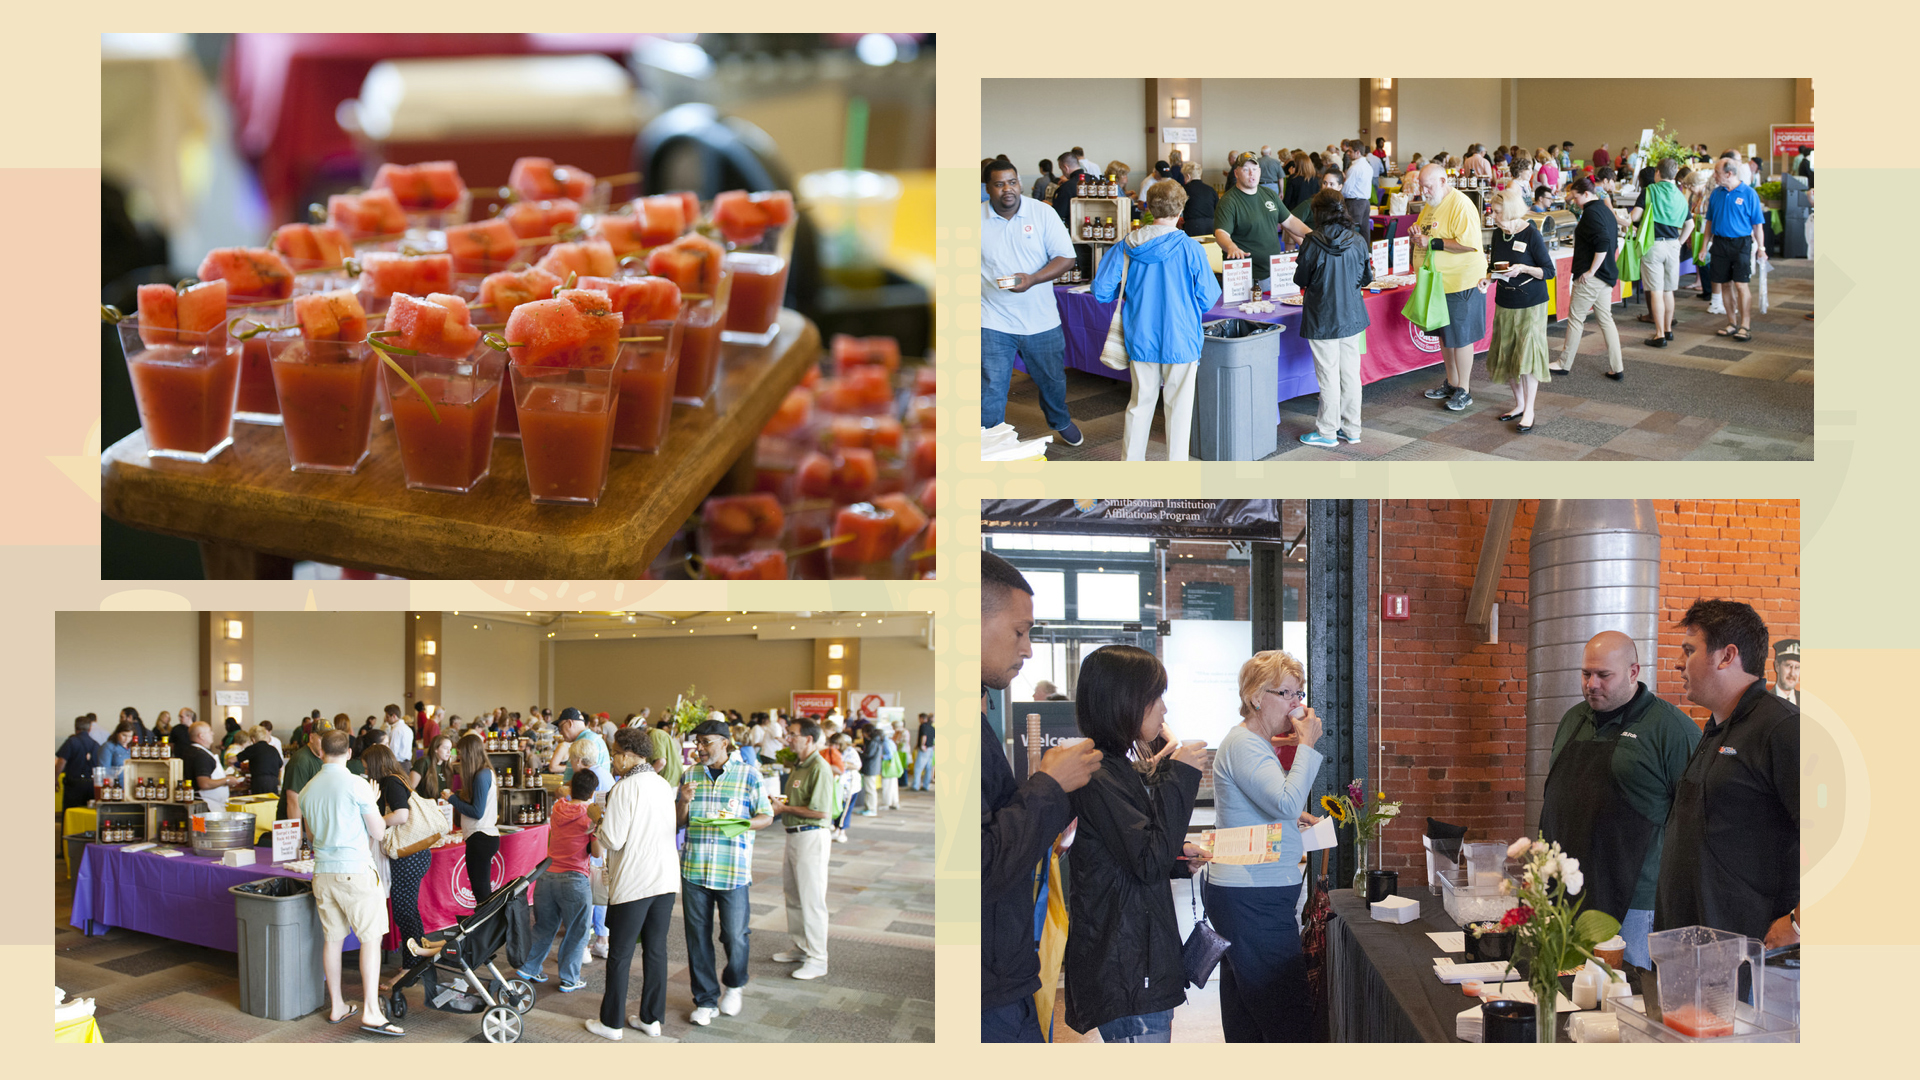 HTHG WQED 2015 crowd and food slide